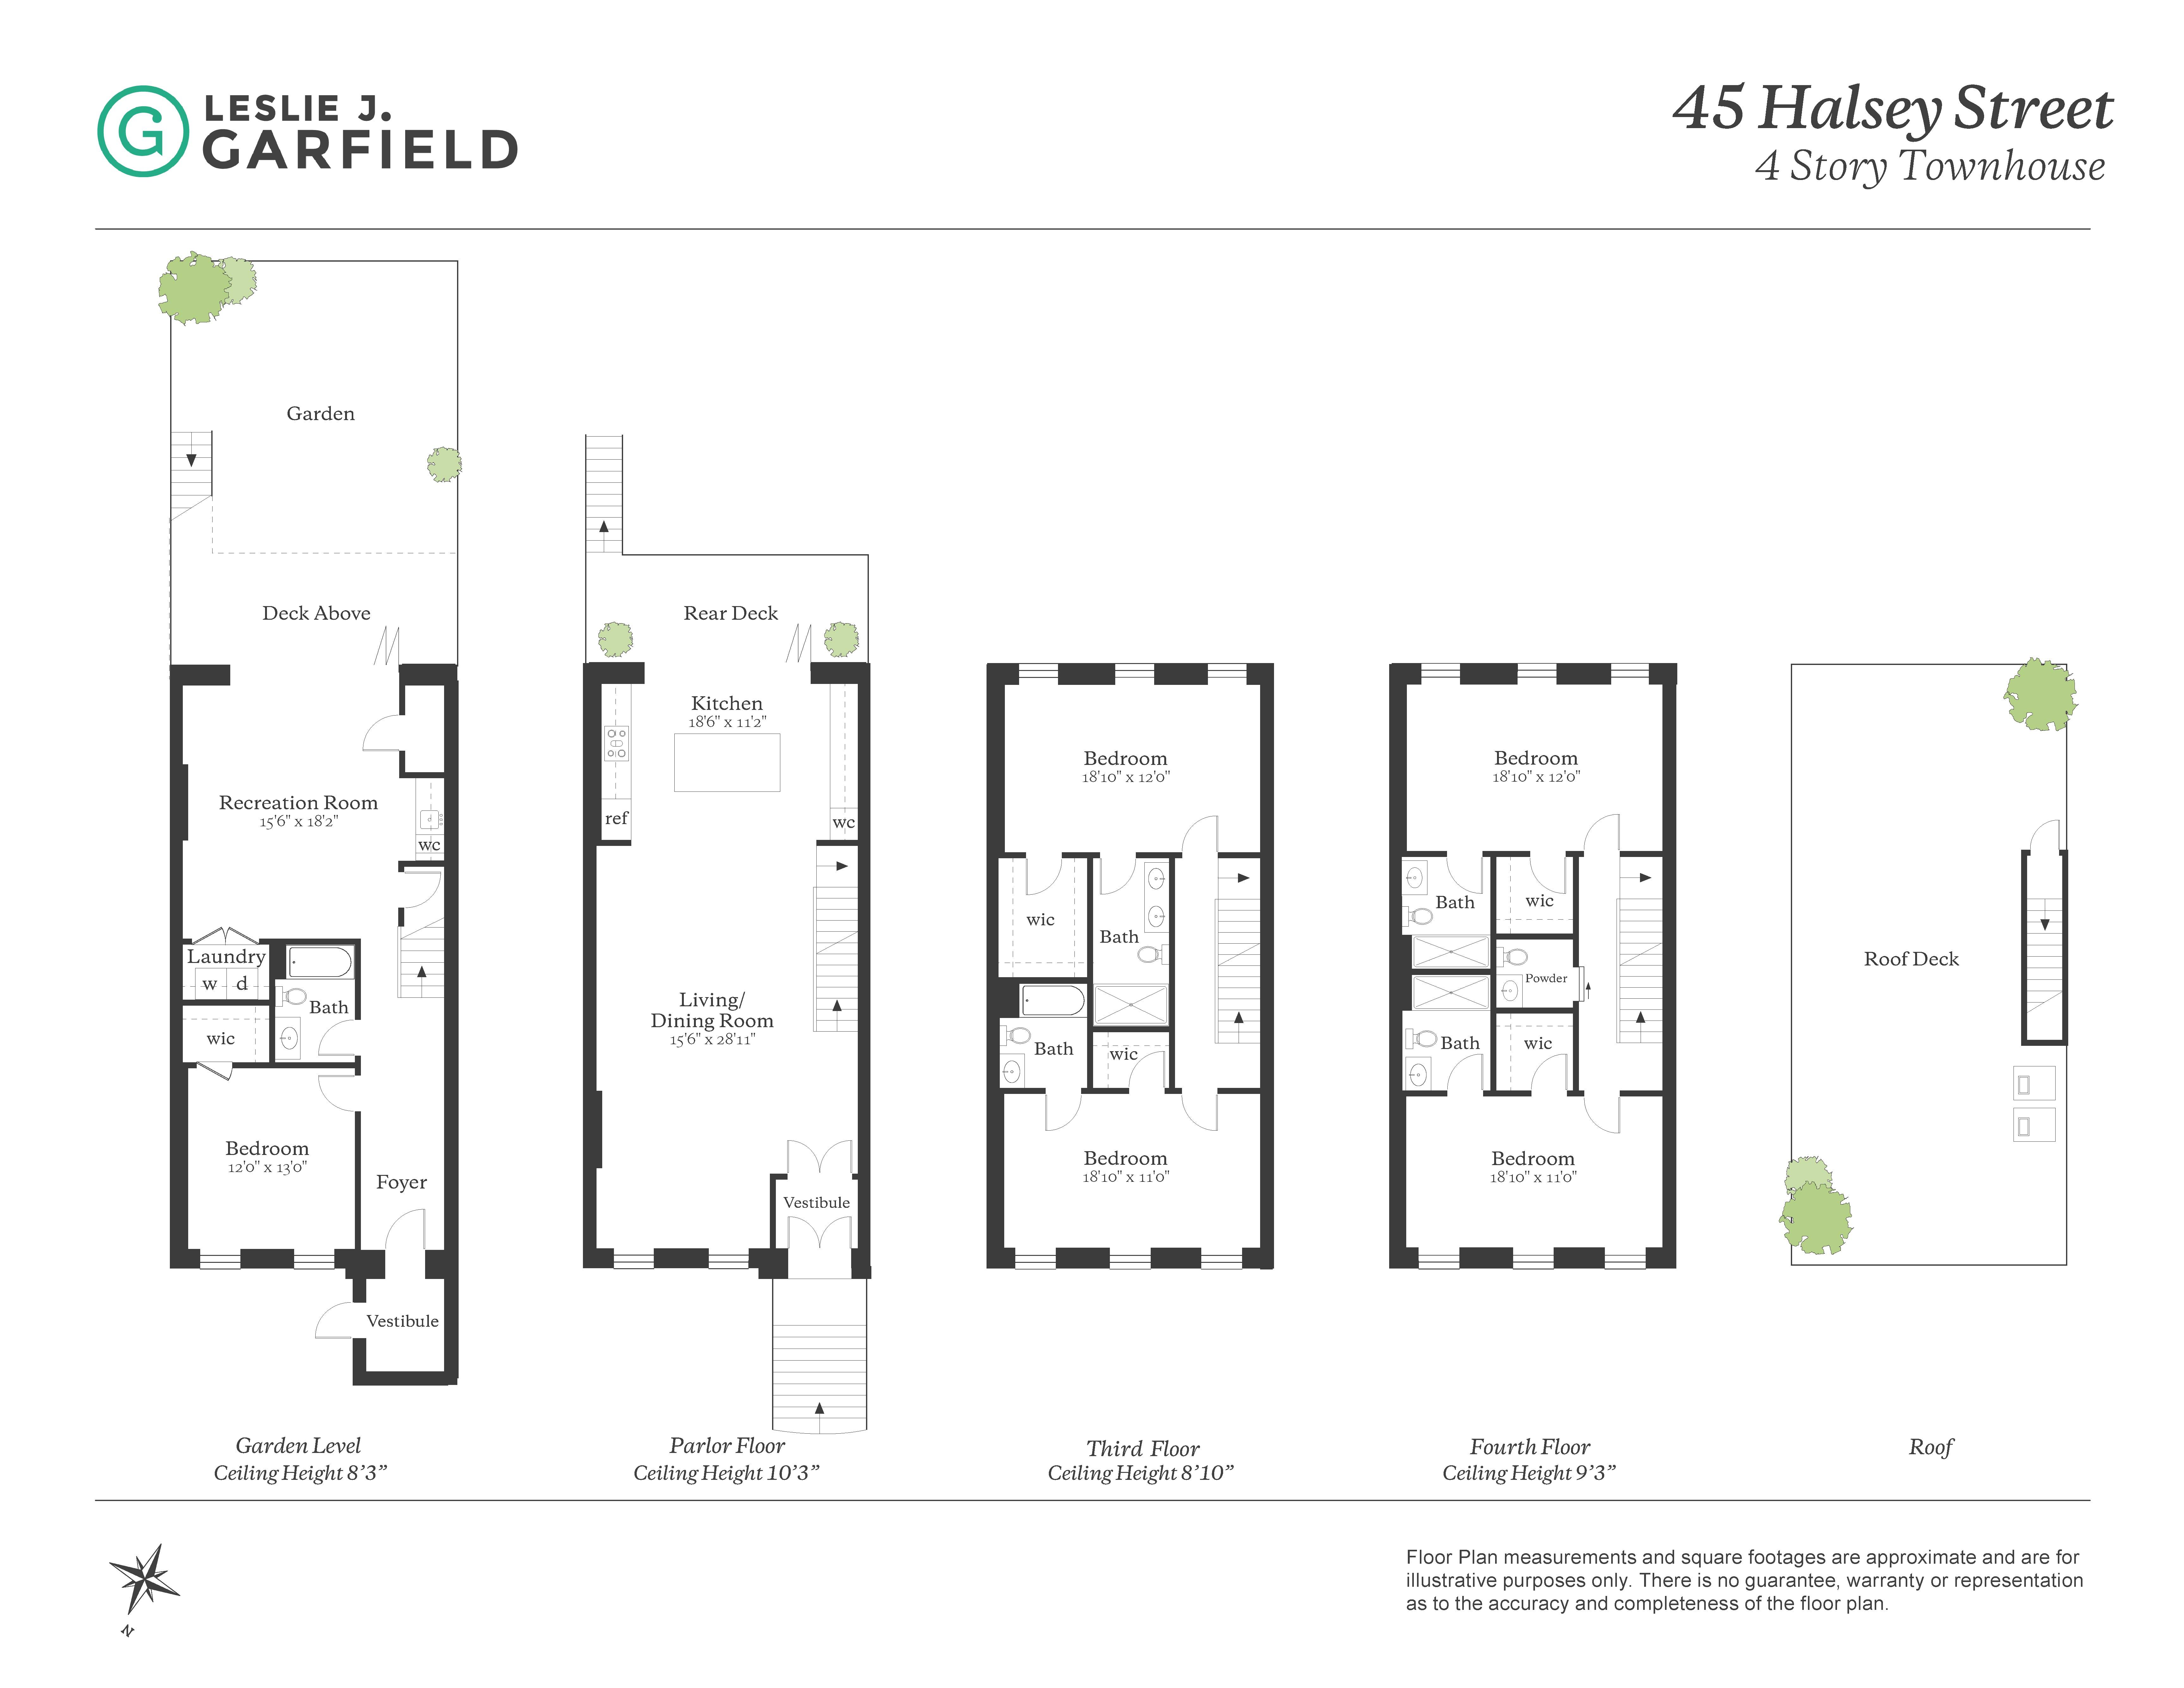 45 Halsey Street - b9717650-7b0f-44d1-97c2-95e8df07873c - New York City Townhouse Real Estate